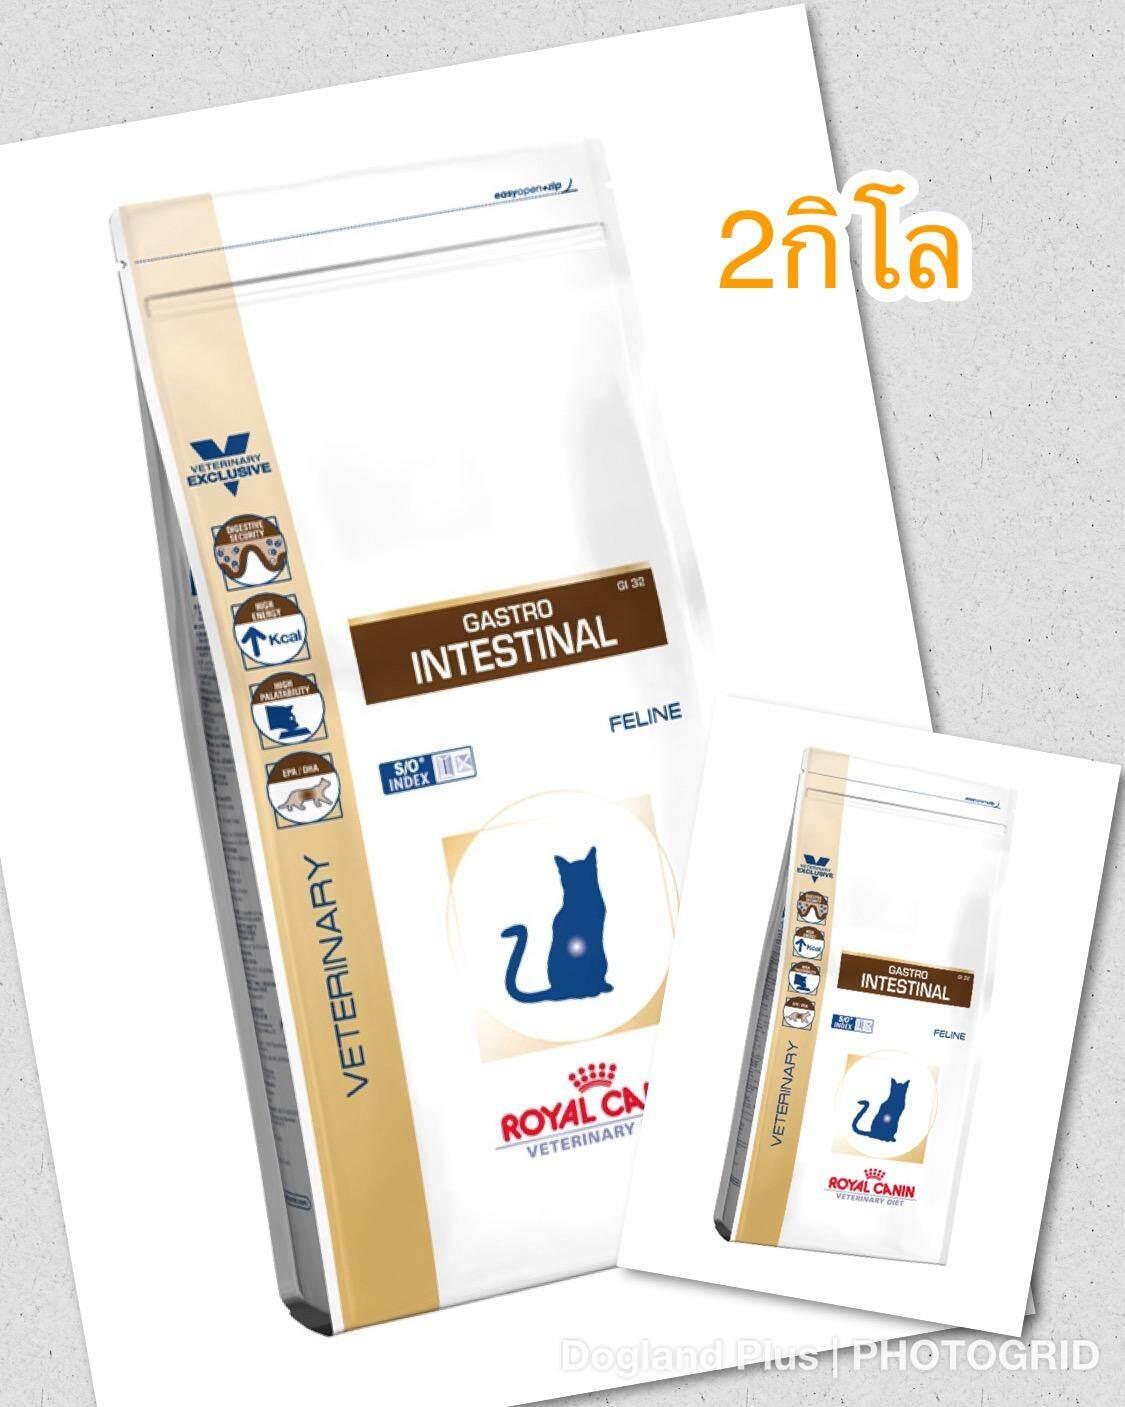 Royal Cani Gastro Intestinal แมว ท้องเสีย 2 กิโล.